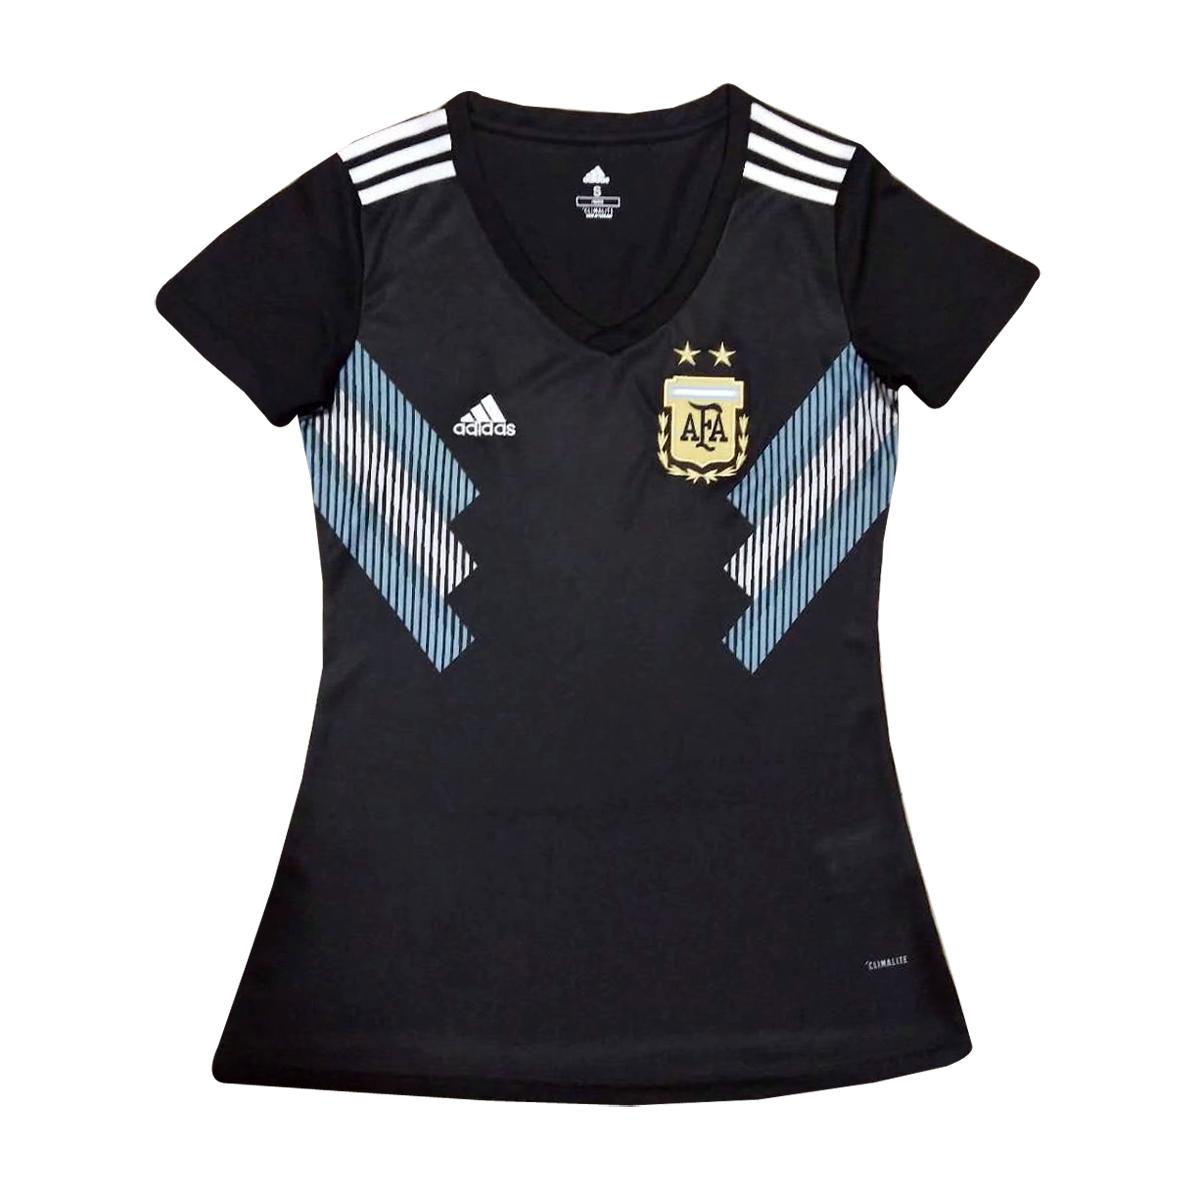 db4140ae8b8 US  14.8 - Argentina FIFA World Cup 2018 Away Jersey Women -  www.yajerseyclub.com